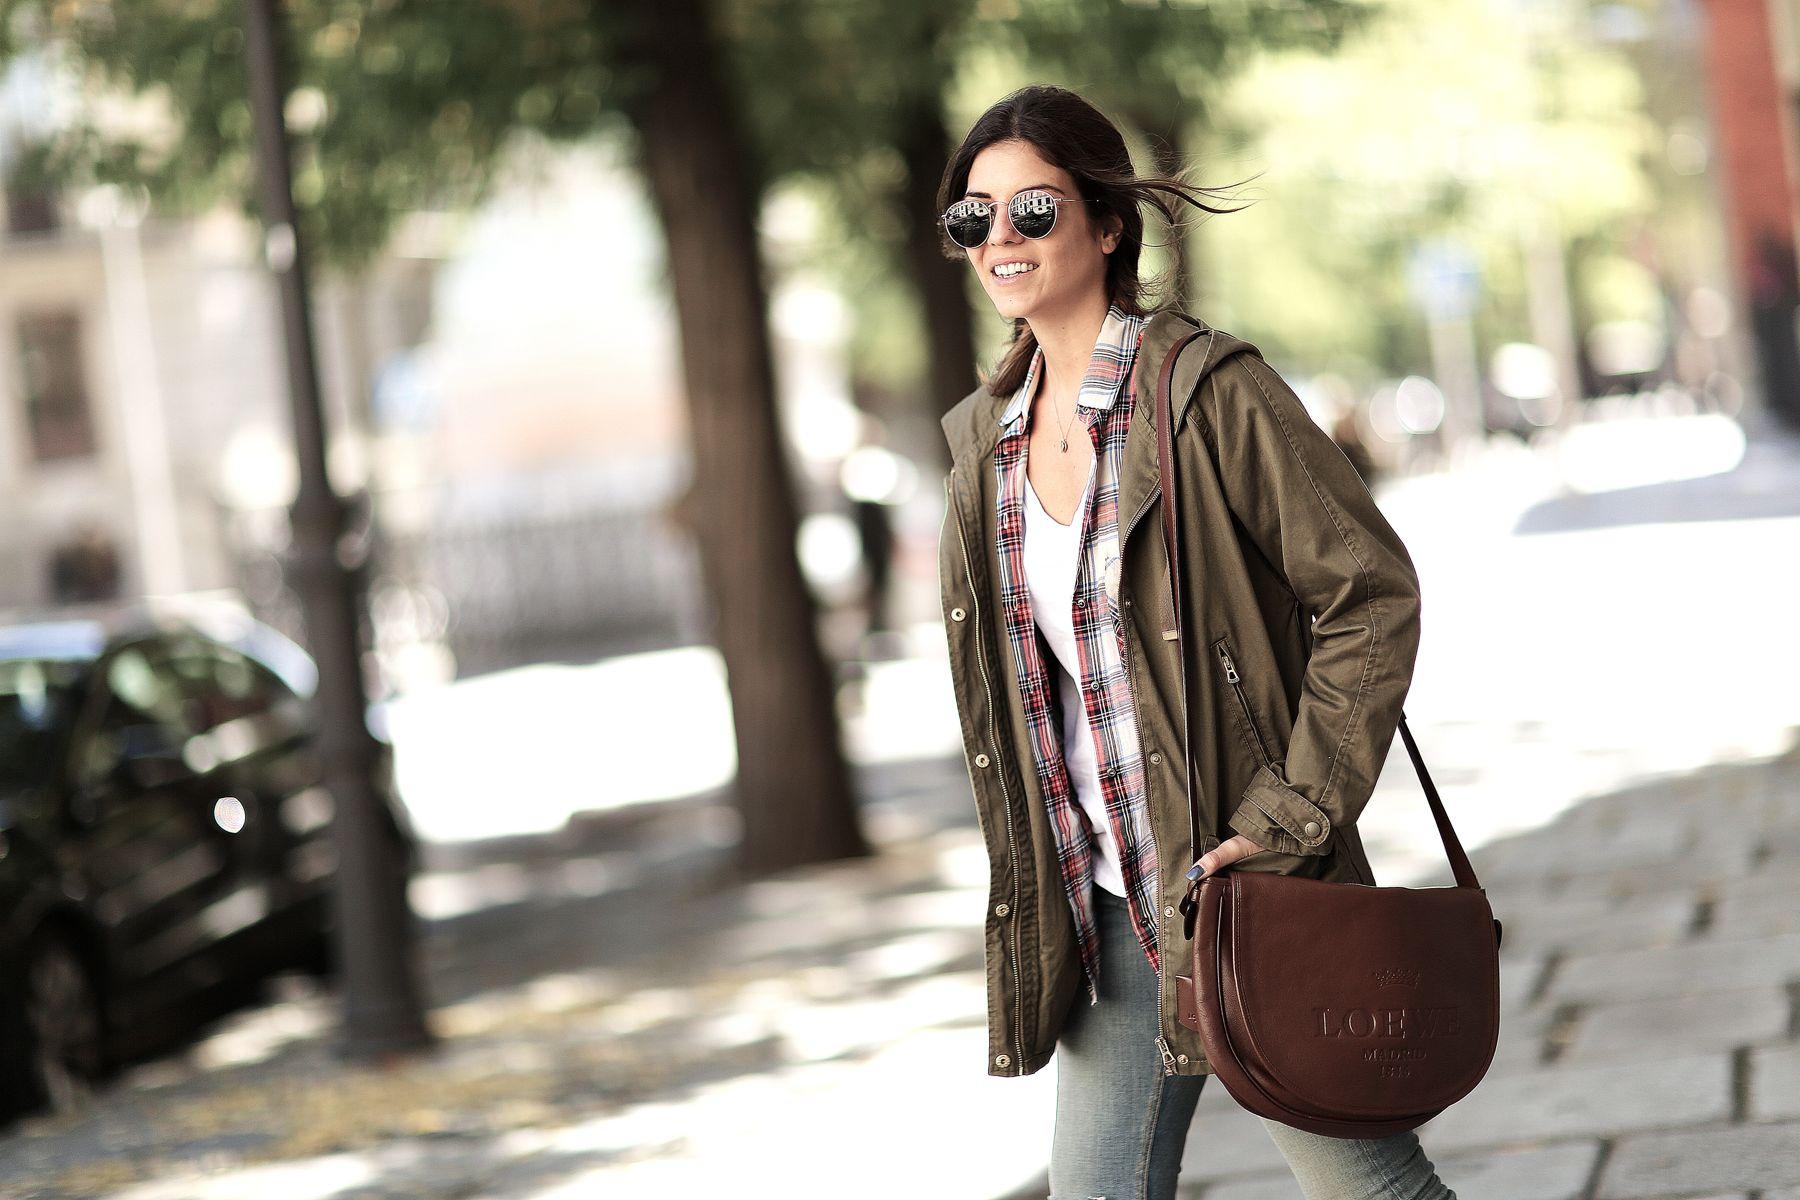 trendy-taste-look-outfit-street-style-trekking-tendencia-botas-parka-camisa-cuadros-plaid-shirt-fall-otoño-8